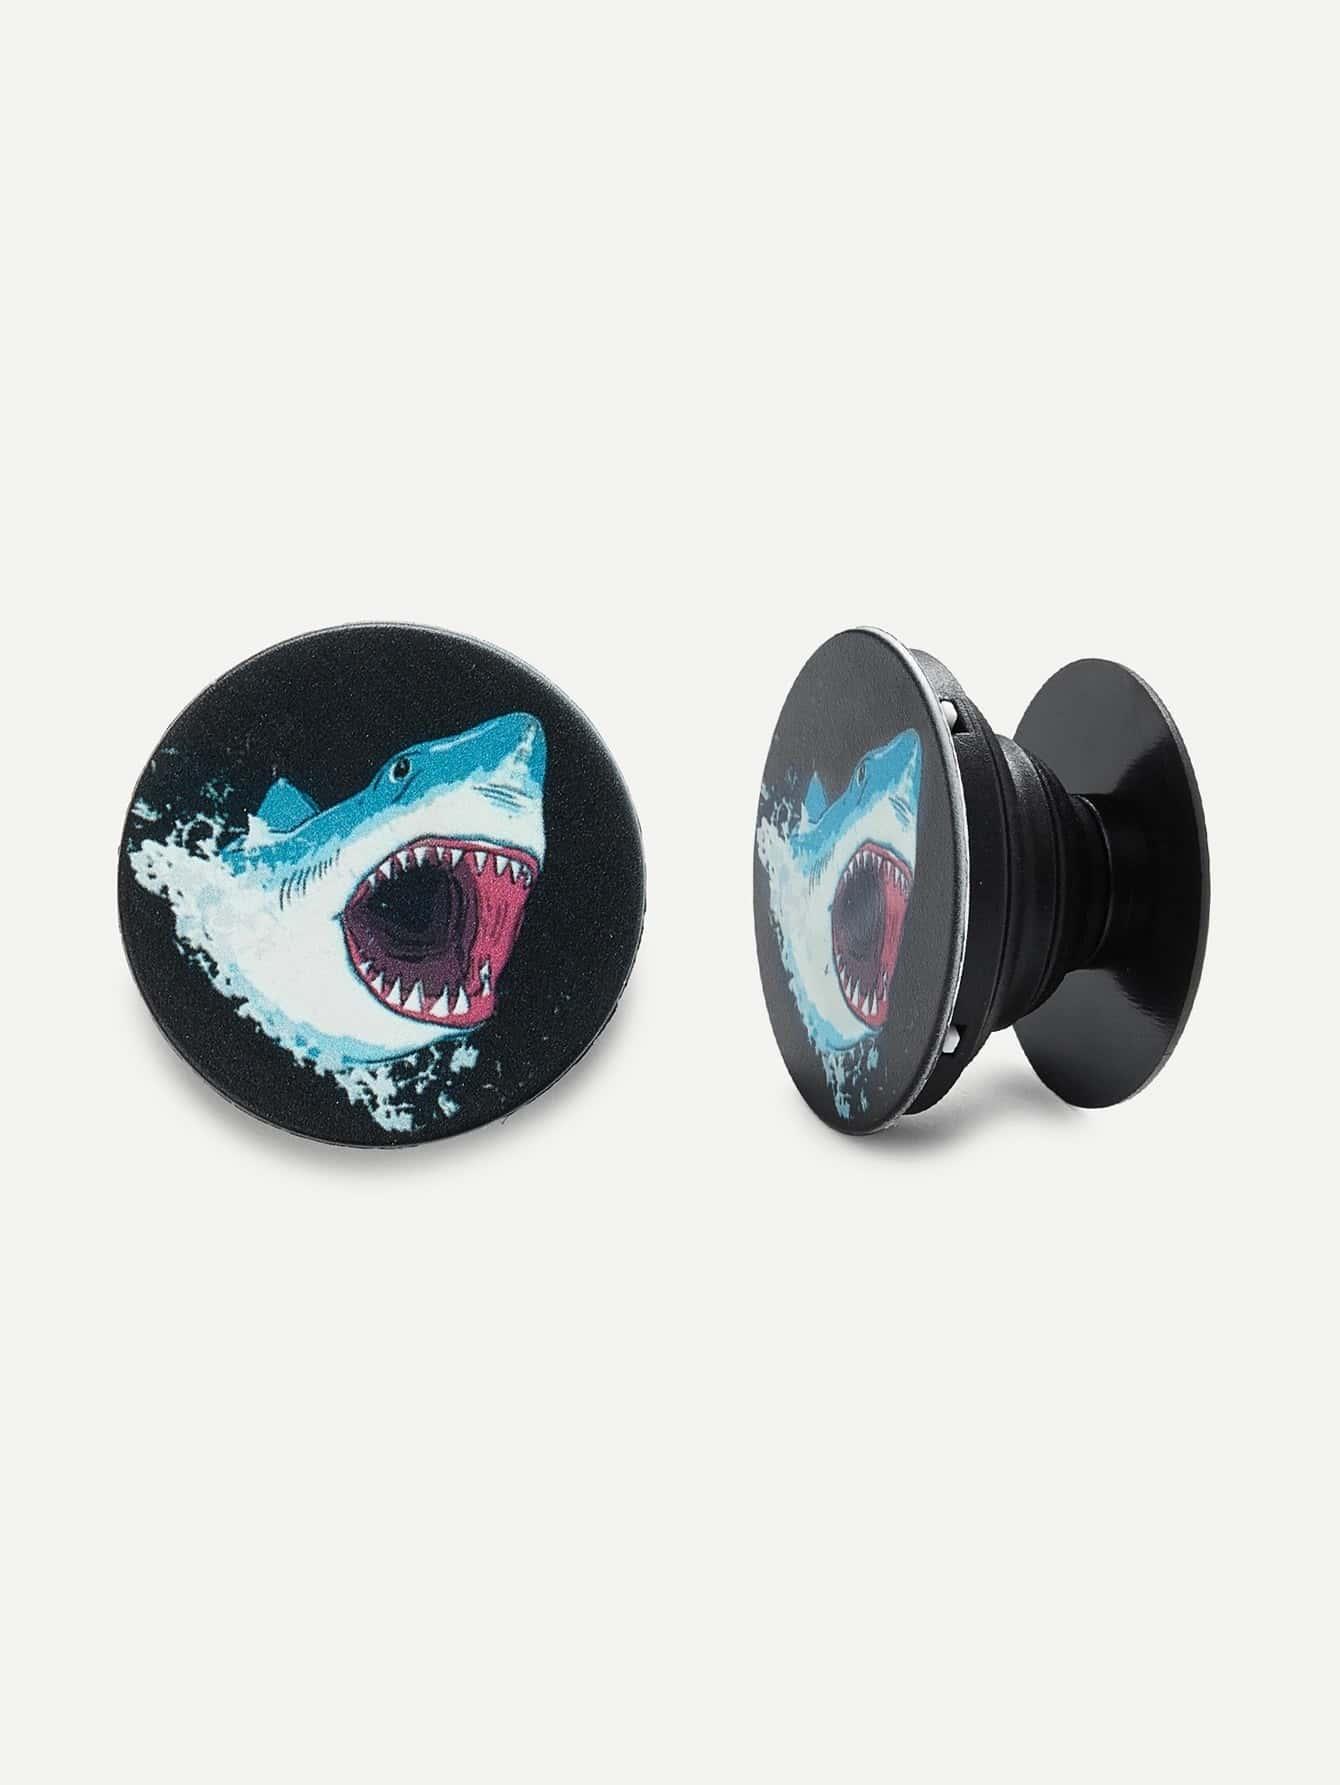 Shark Pattern Gasbag Phone Holder avocado pattern gasbag phone holder